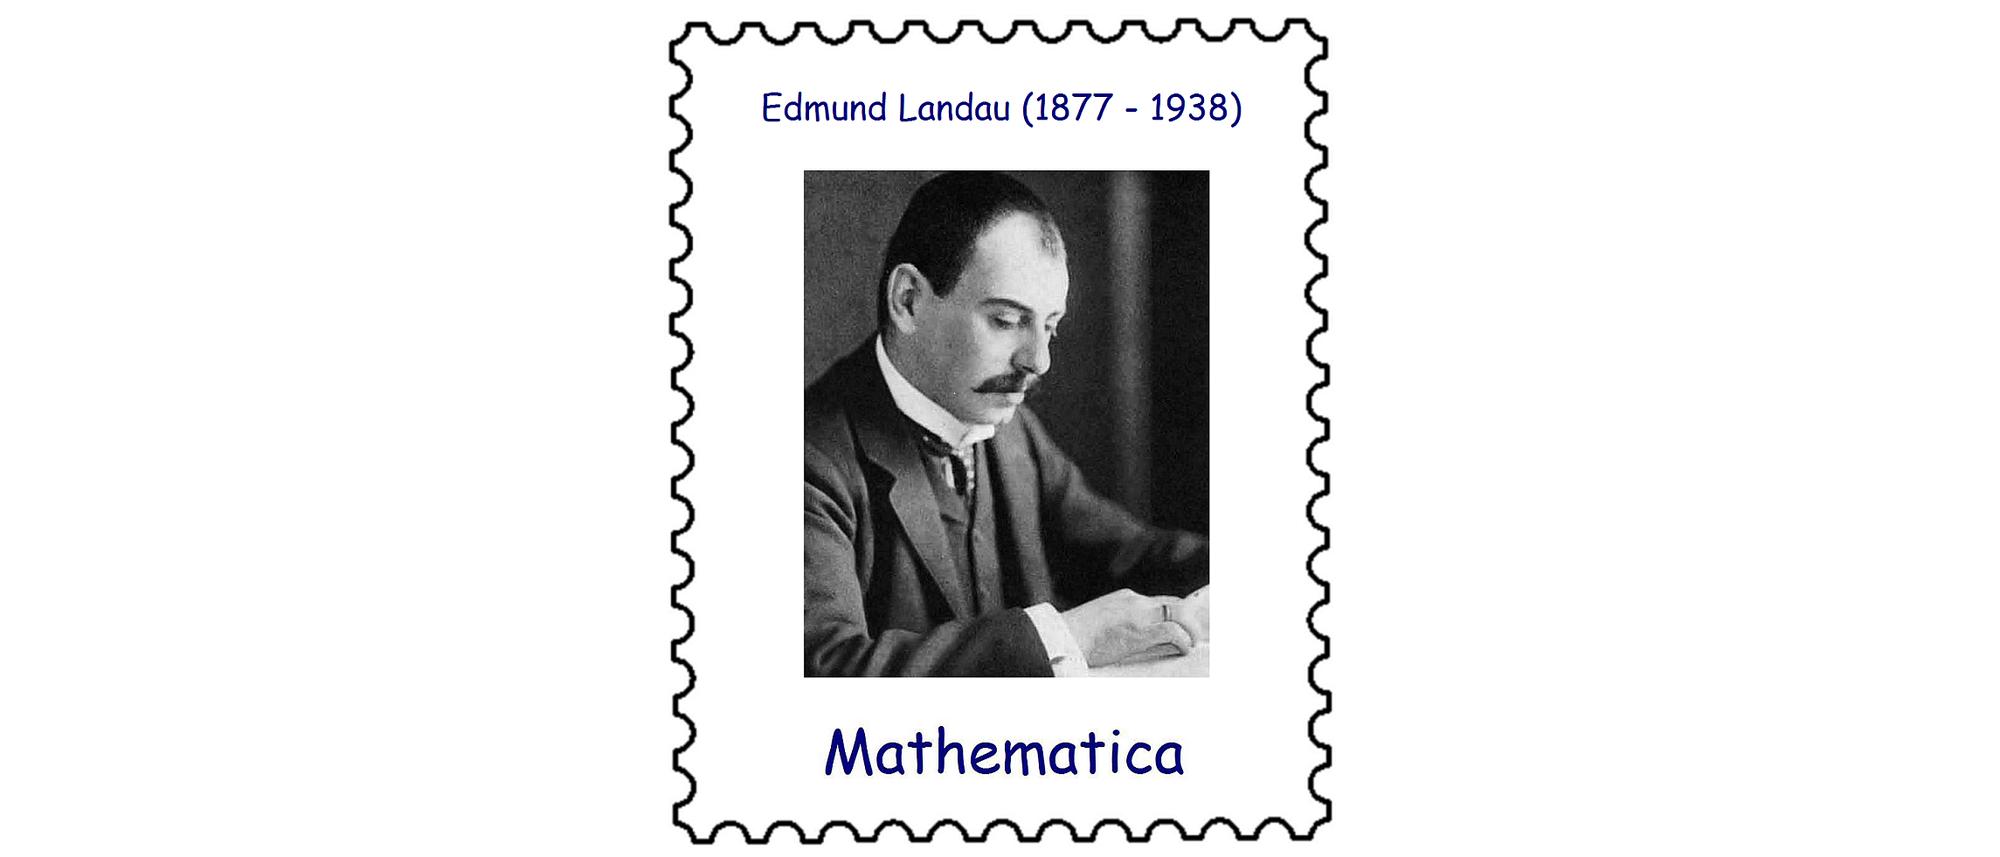 Edmund Landau (1877 – 1938)